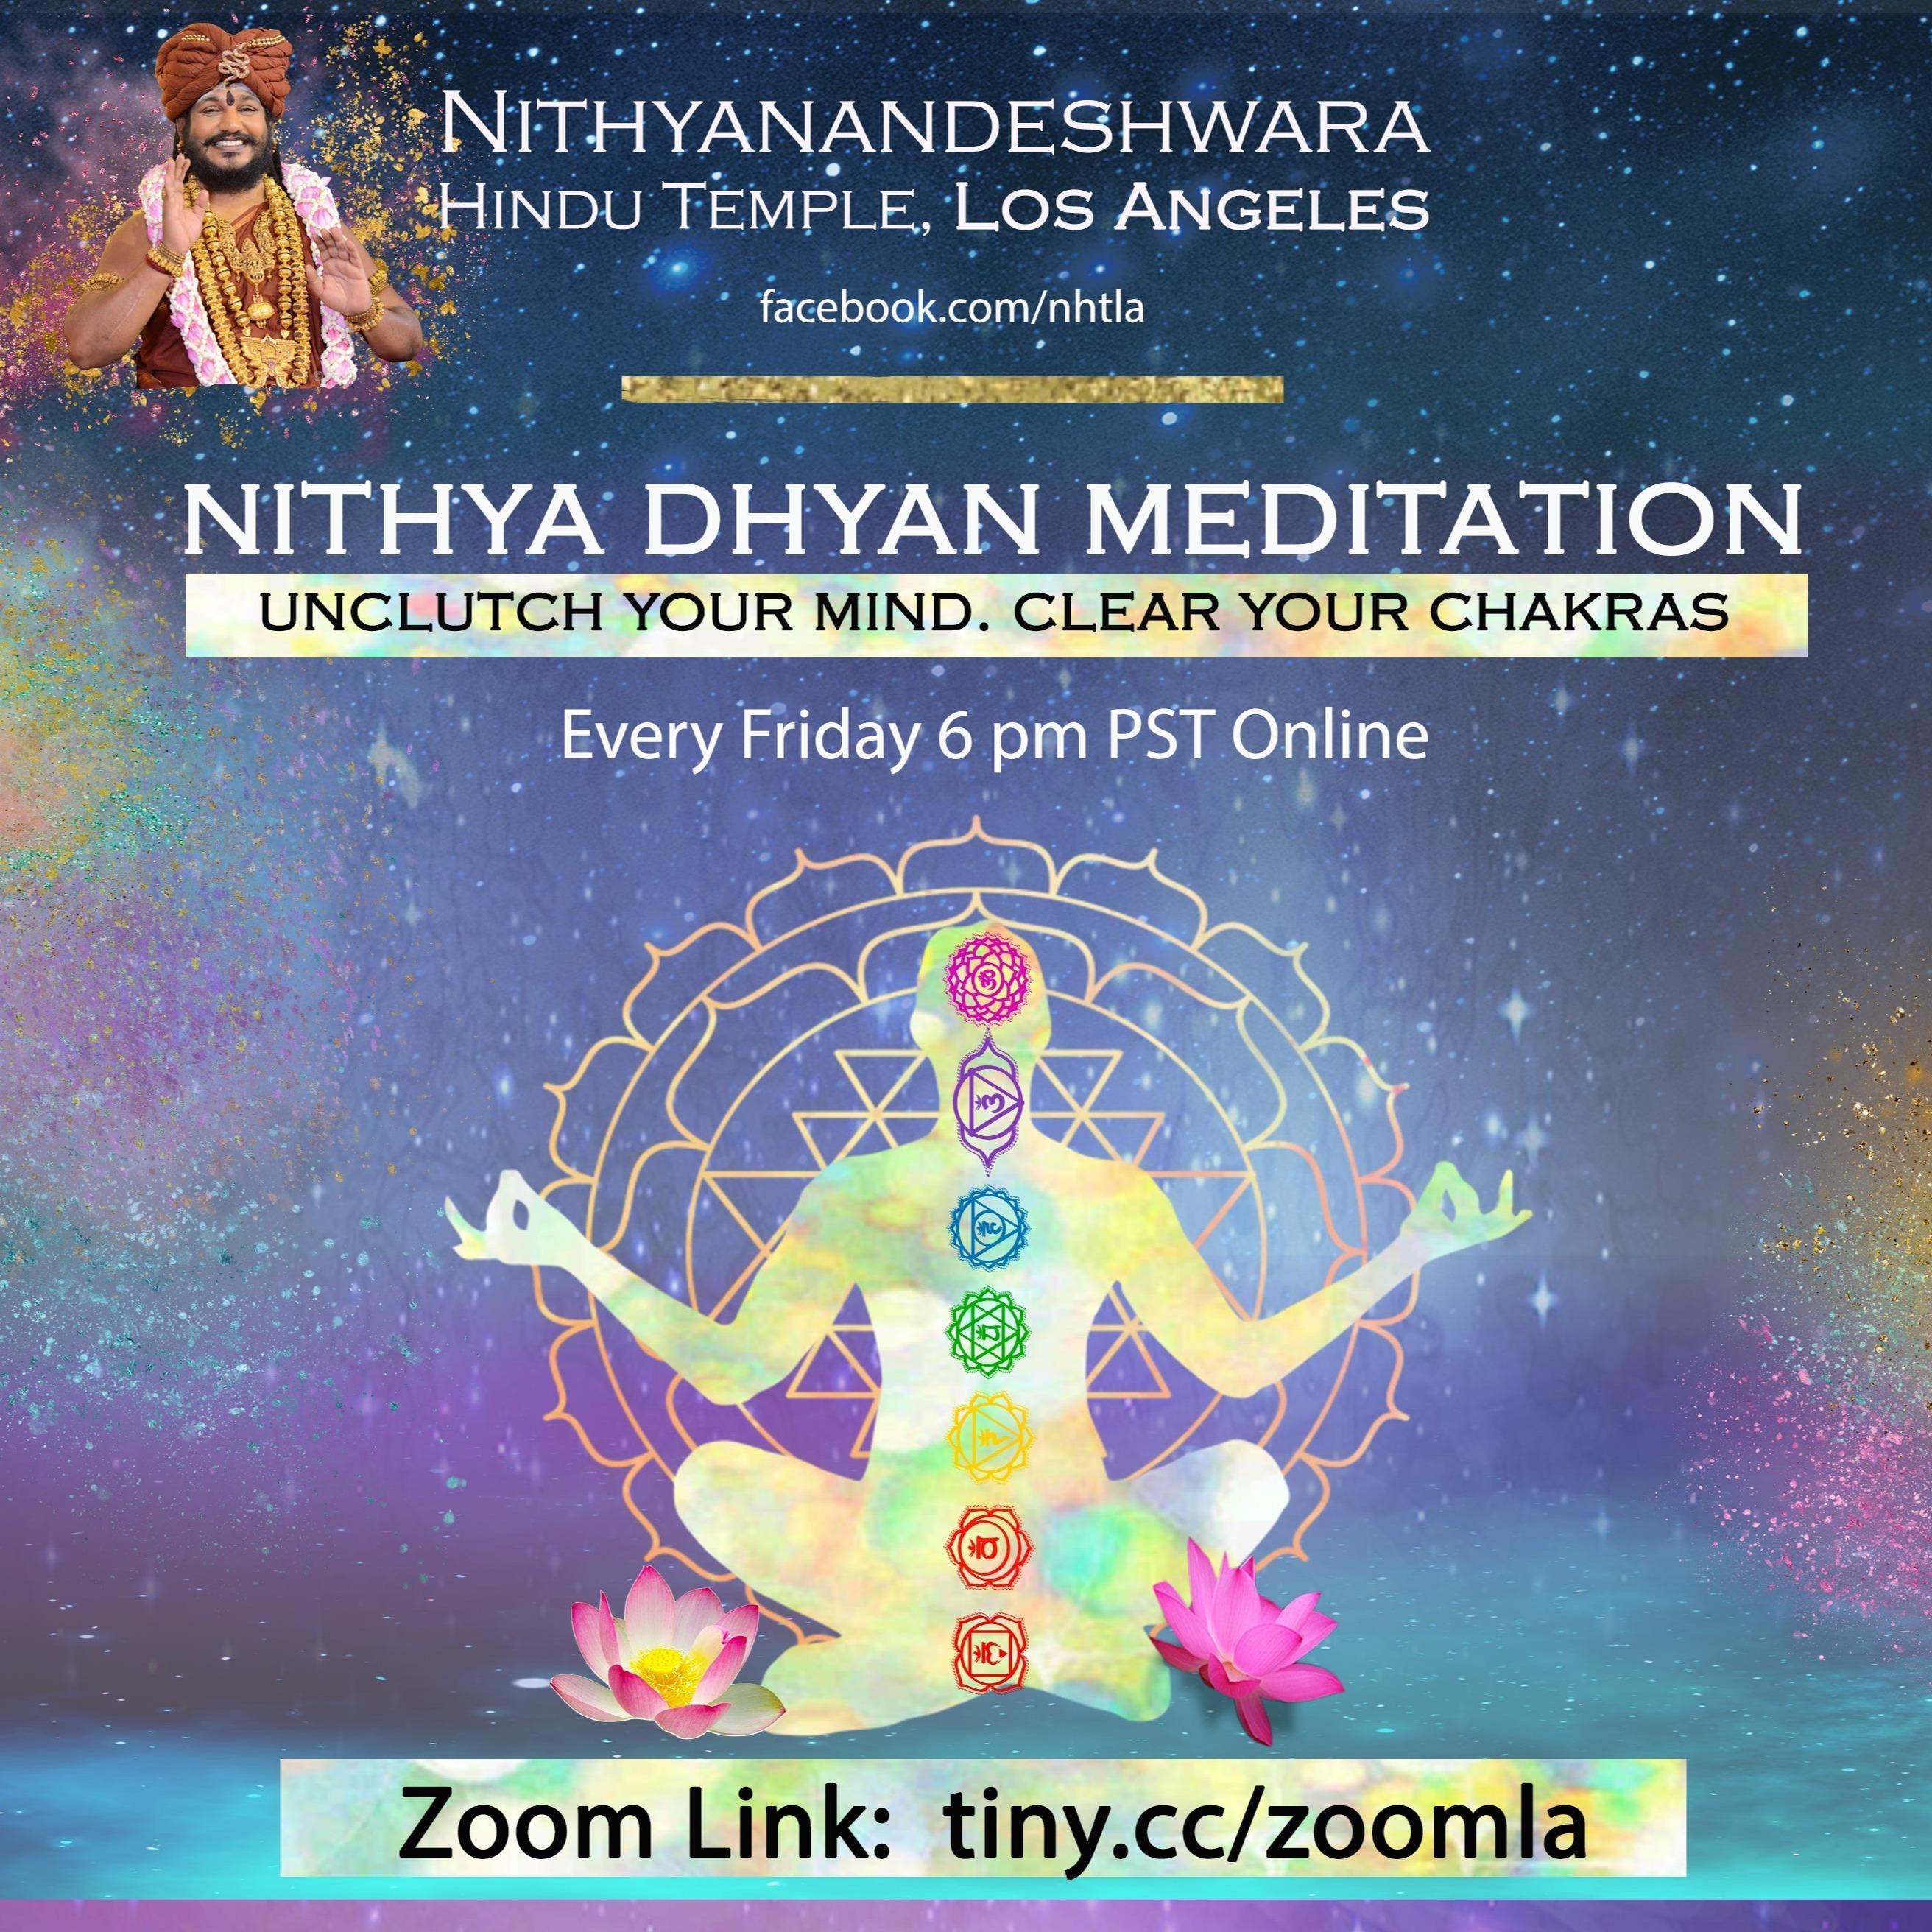 Nithya Dhyan Meditation Class: Fridays 6 pm PST